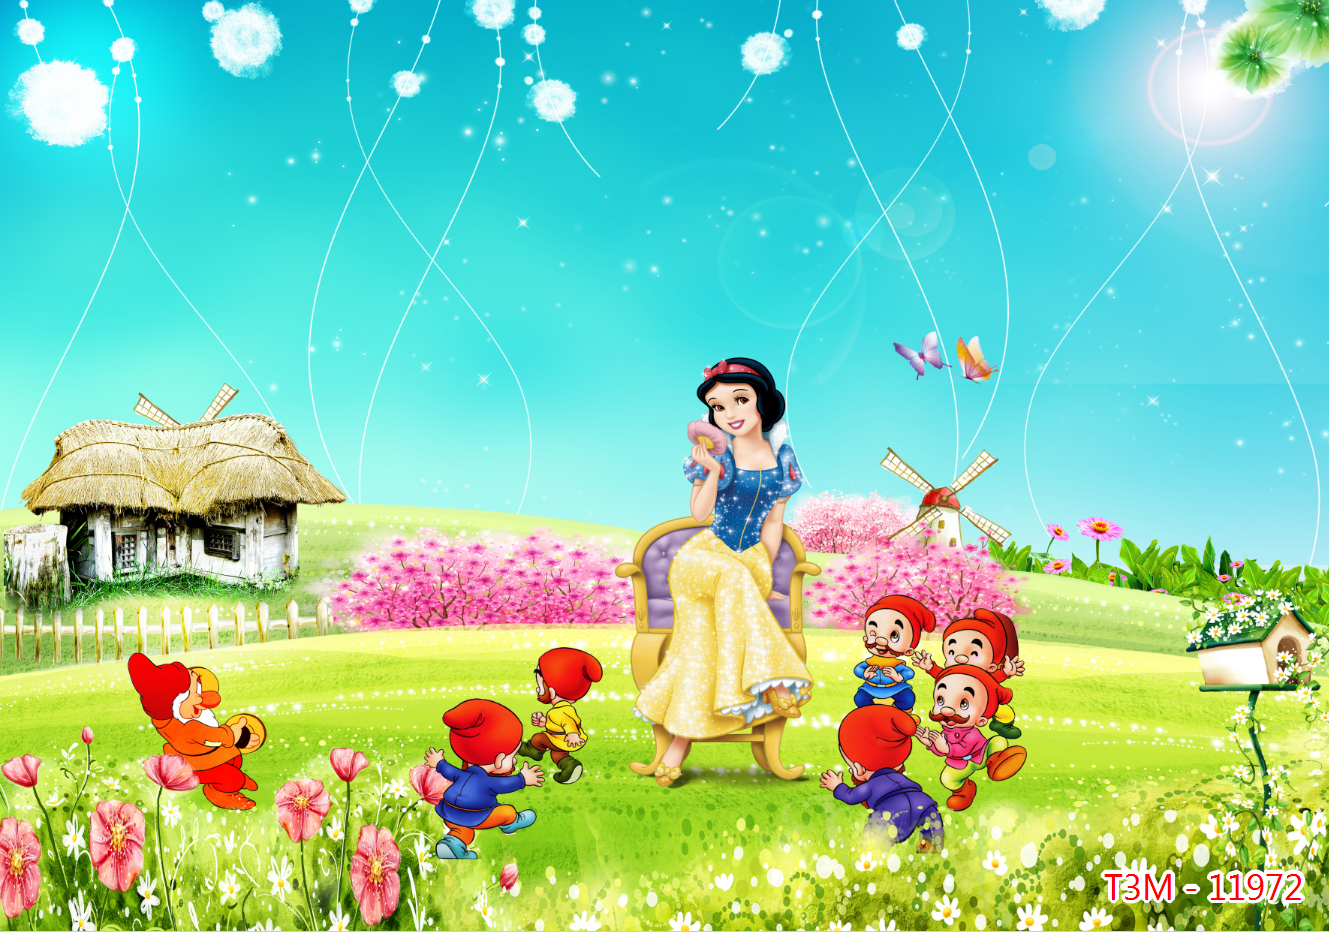 Tranh 3D trẻ em